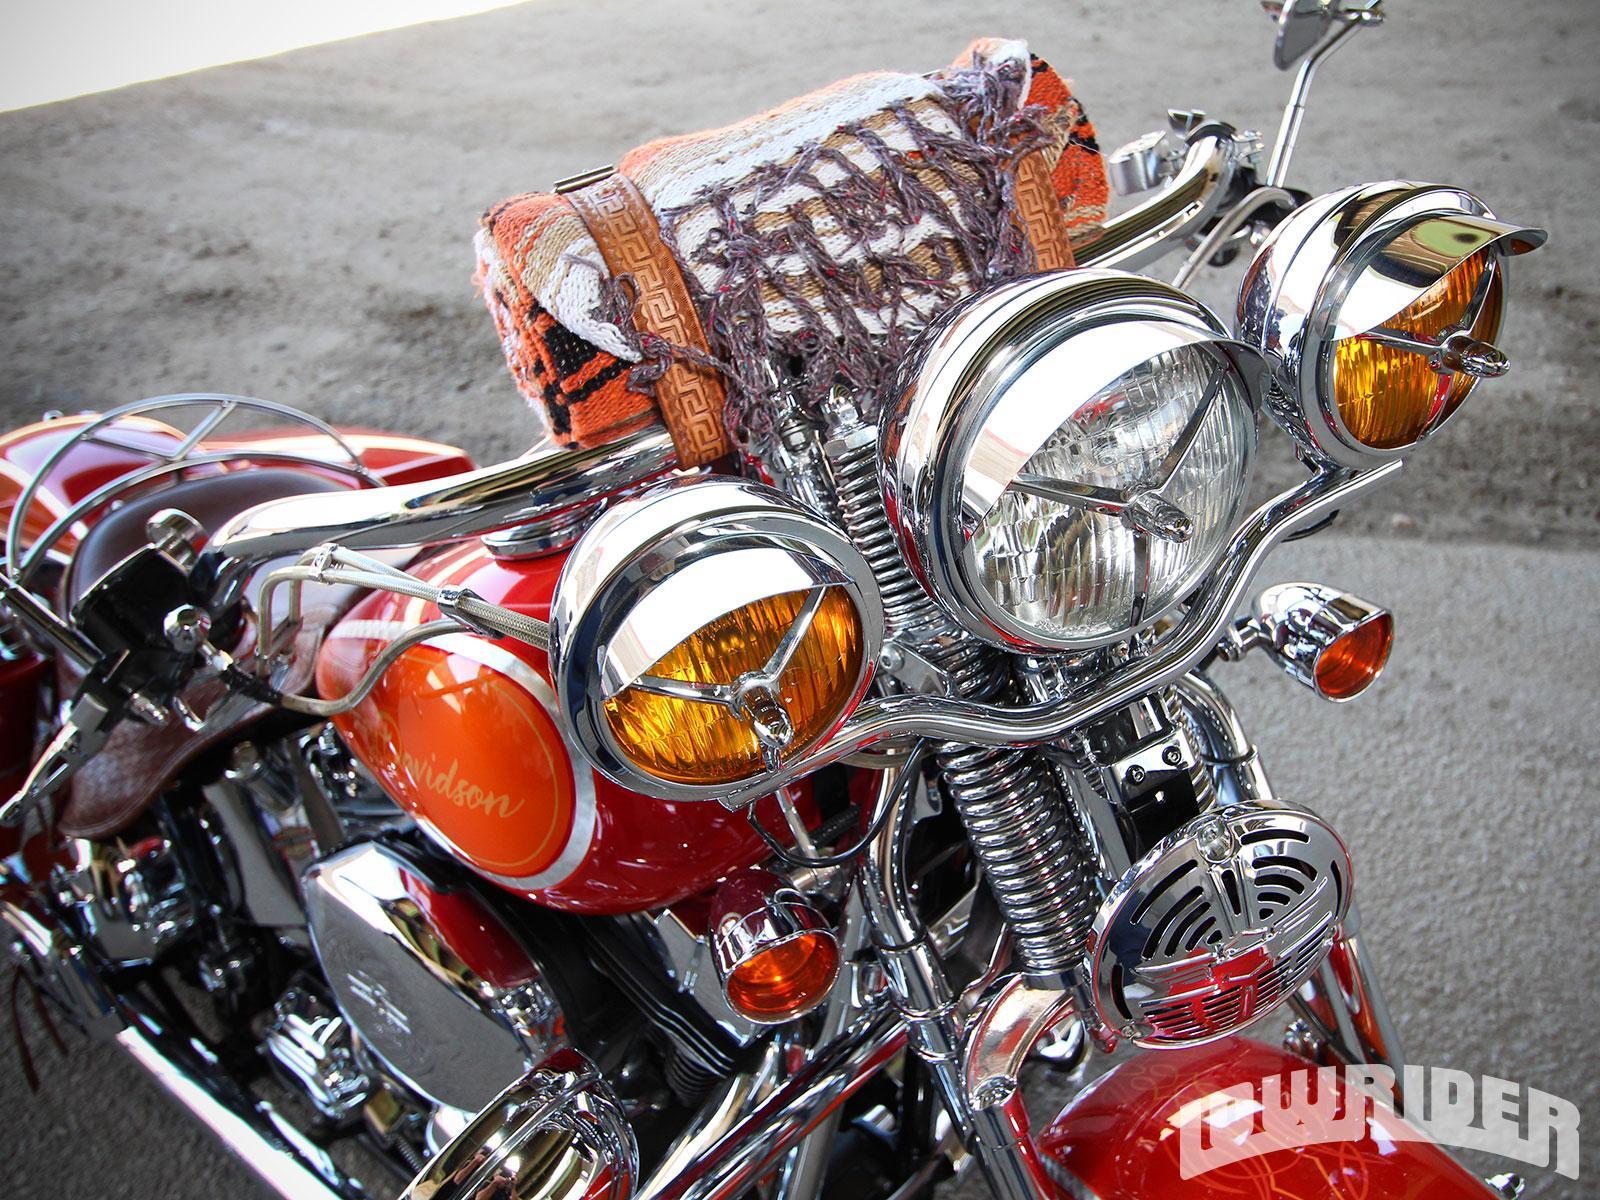 2003 Harley Davidson 100th Anniversary Edition Heritage